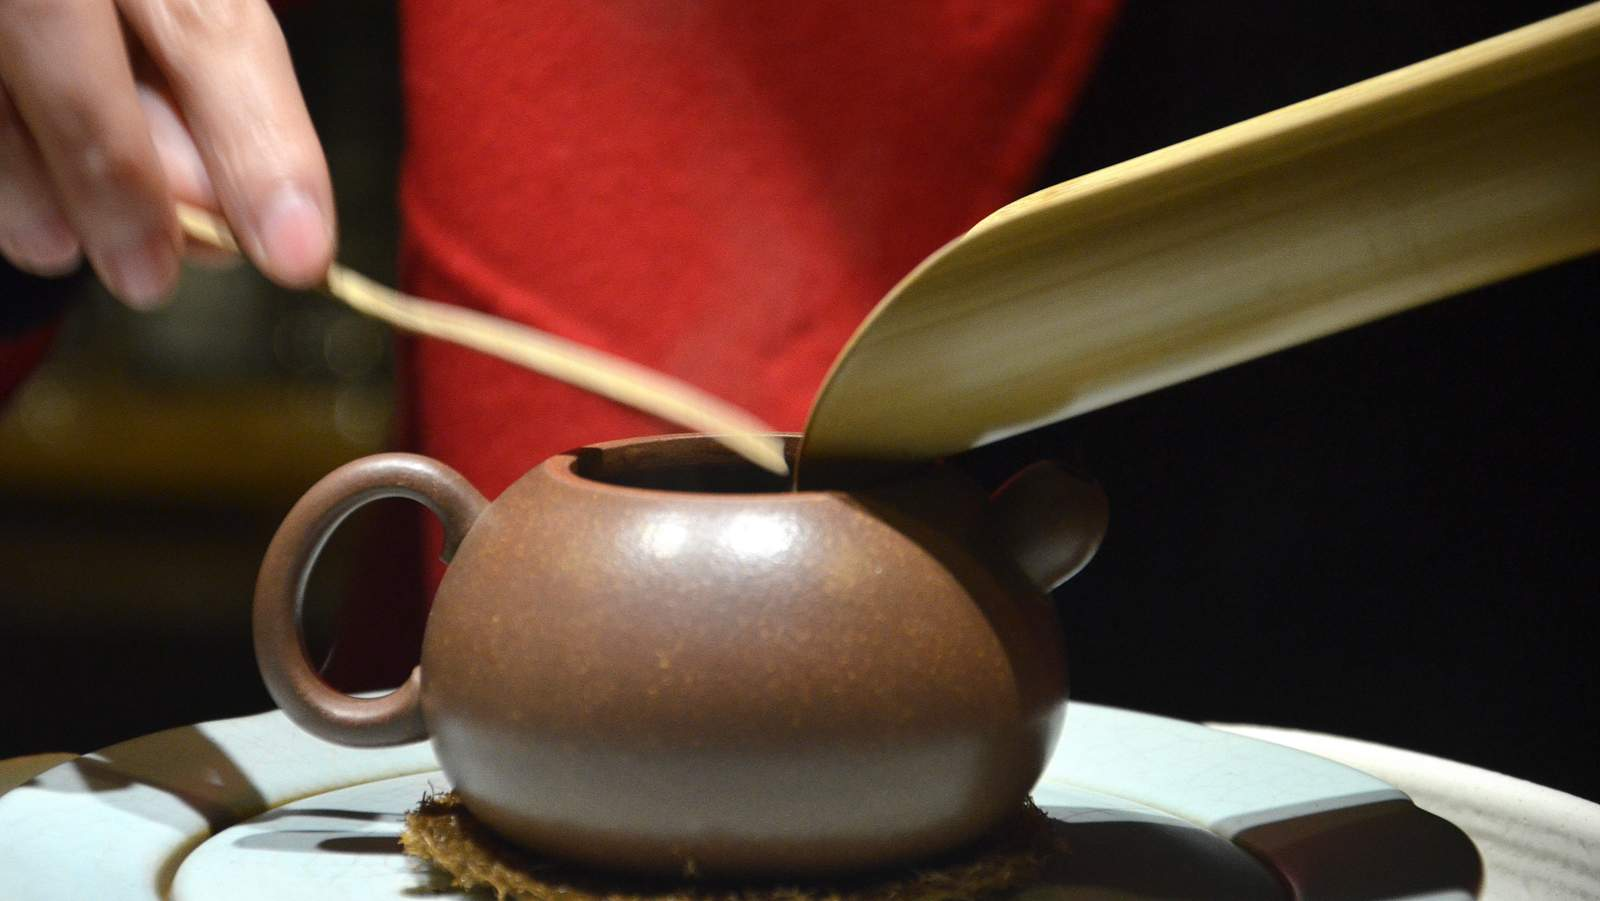 CNNP raw Pu-erh blend 7542, red label from 1996 of Menghai tea factory, fill the pot